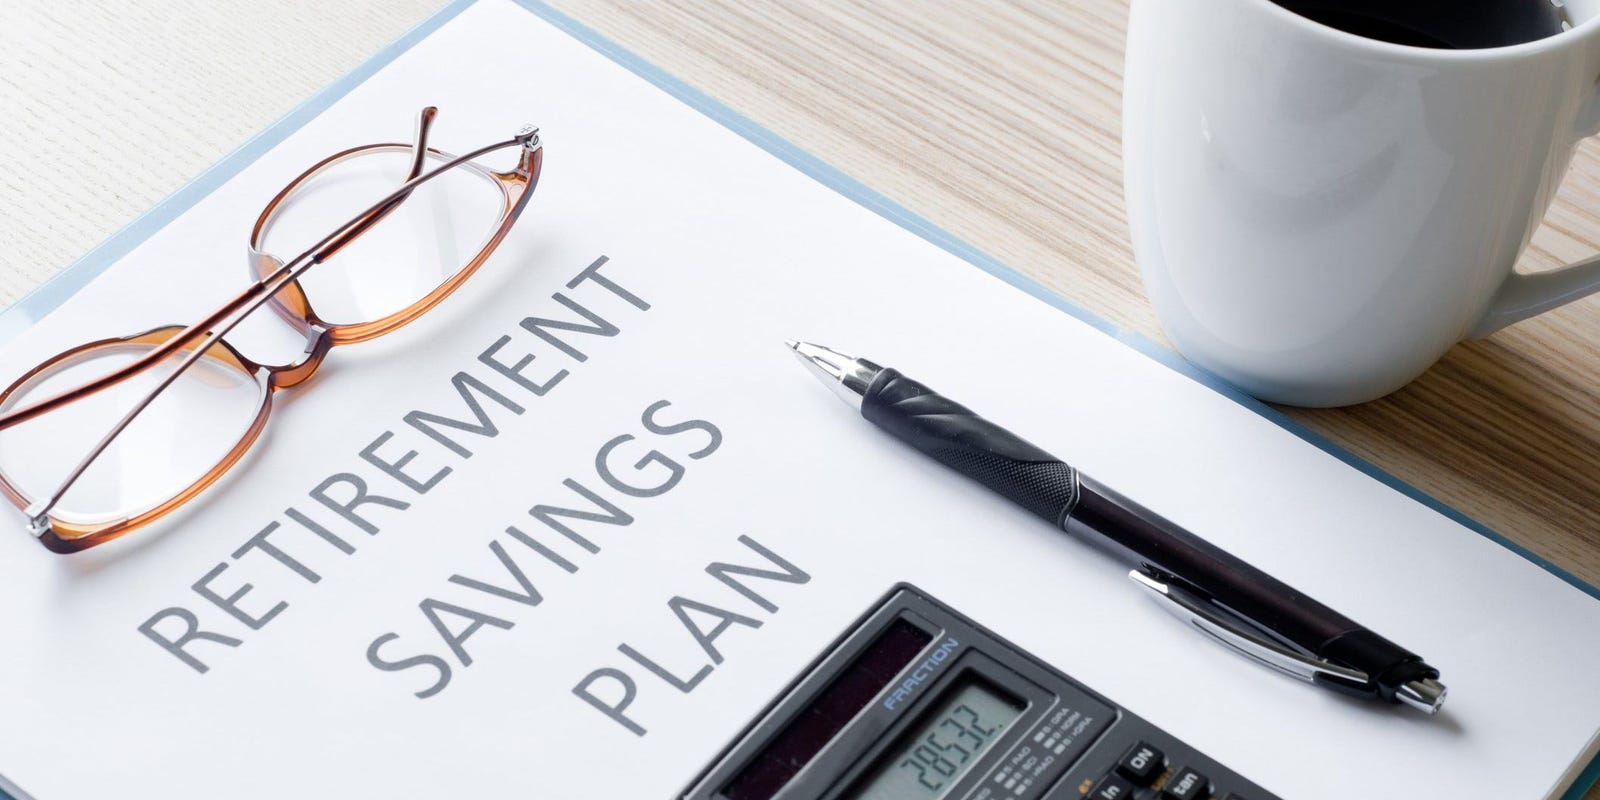 People to delay plans, work longer